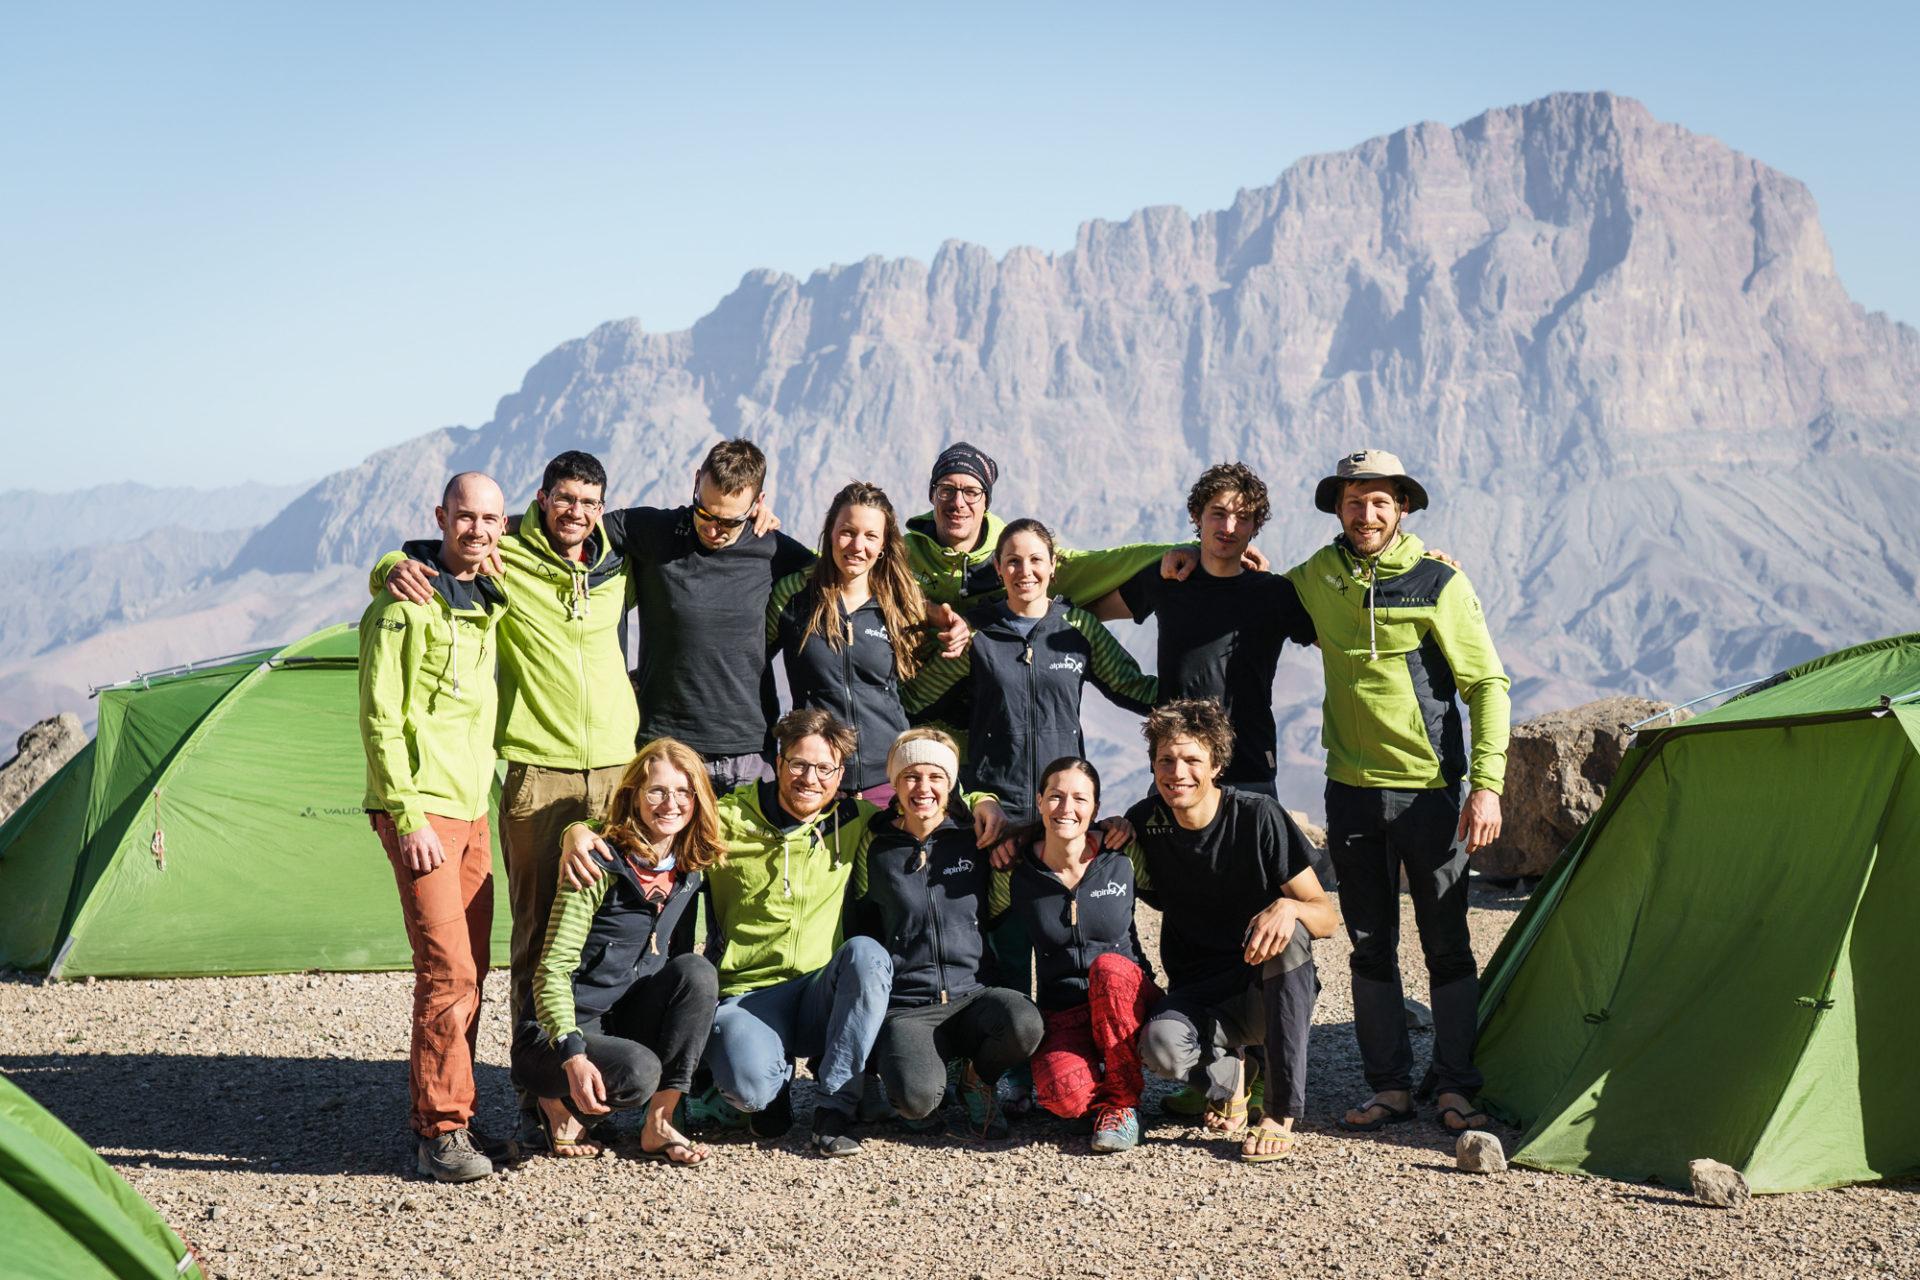 ALPINIST: Kletterfahrt Oman Gruppe 1